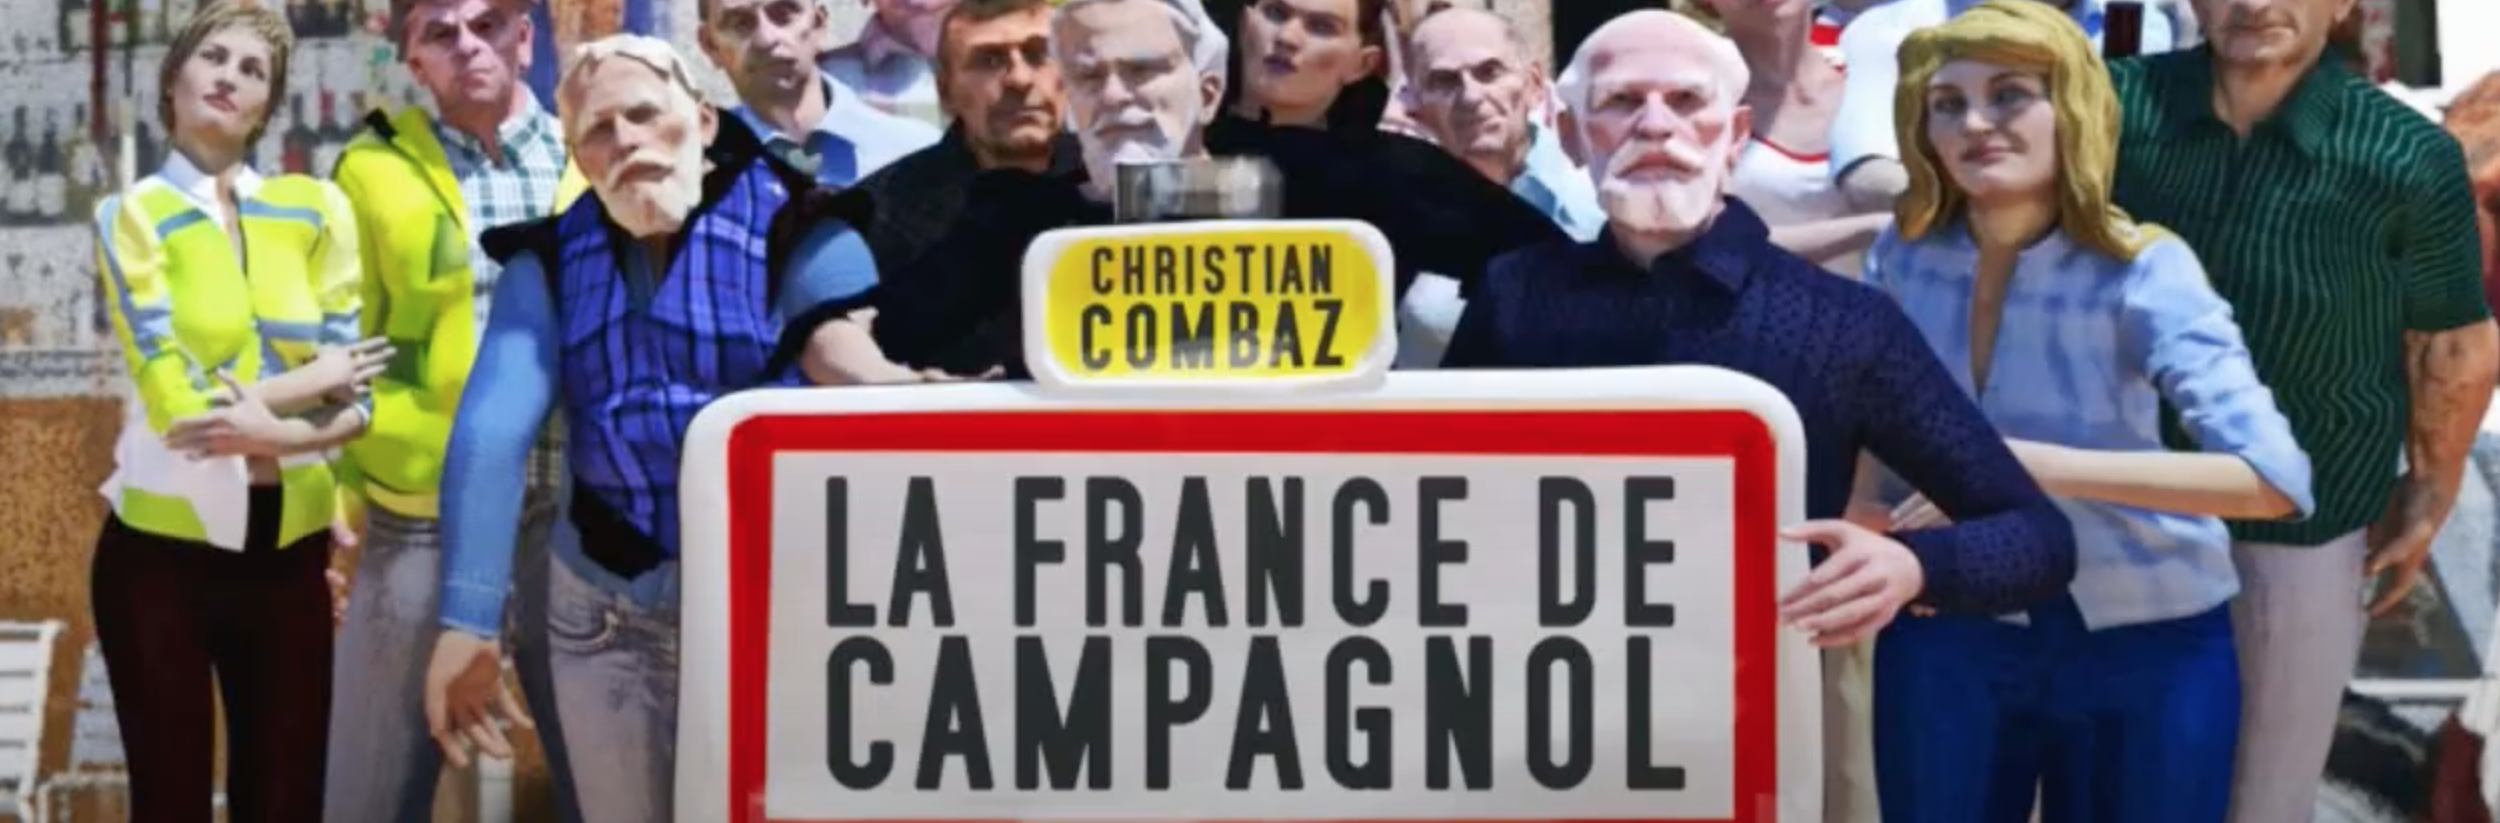 Campagnol Christian Combaz